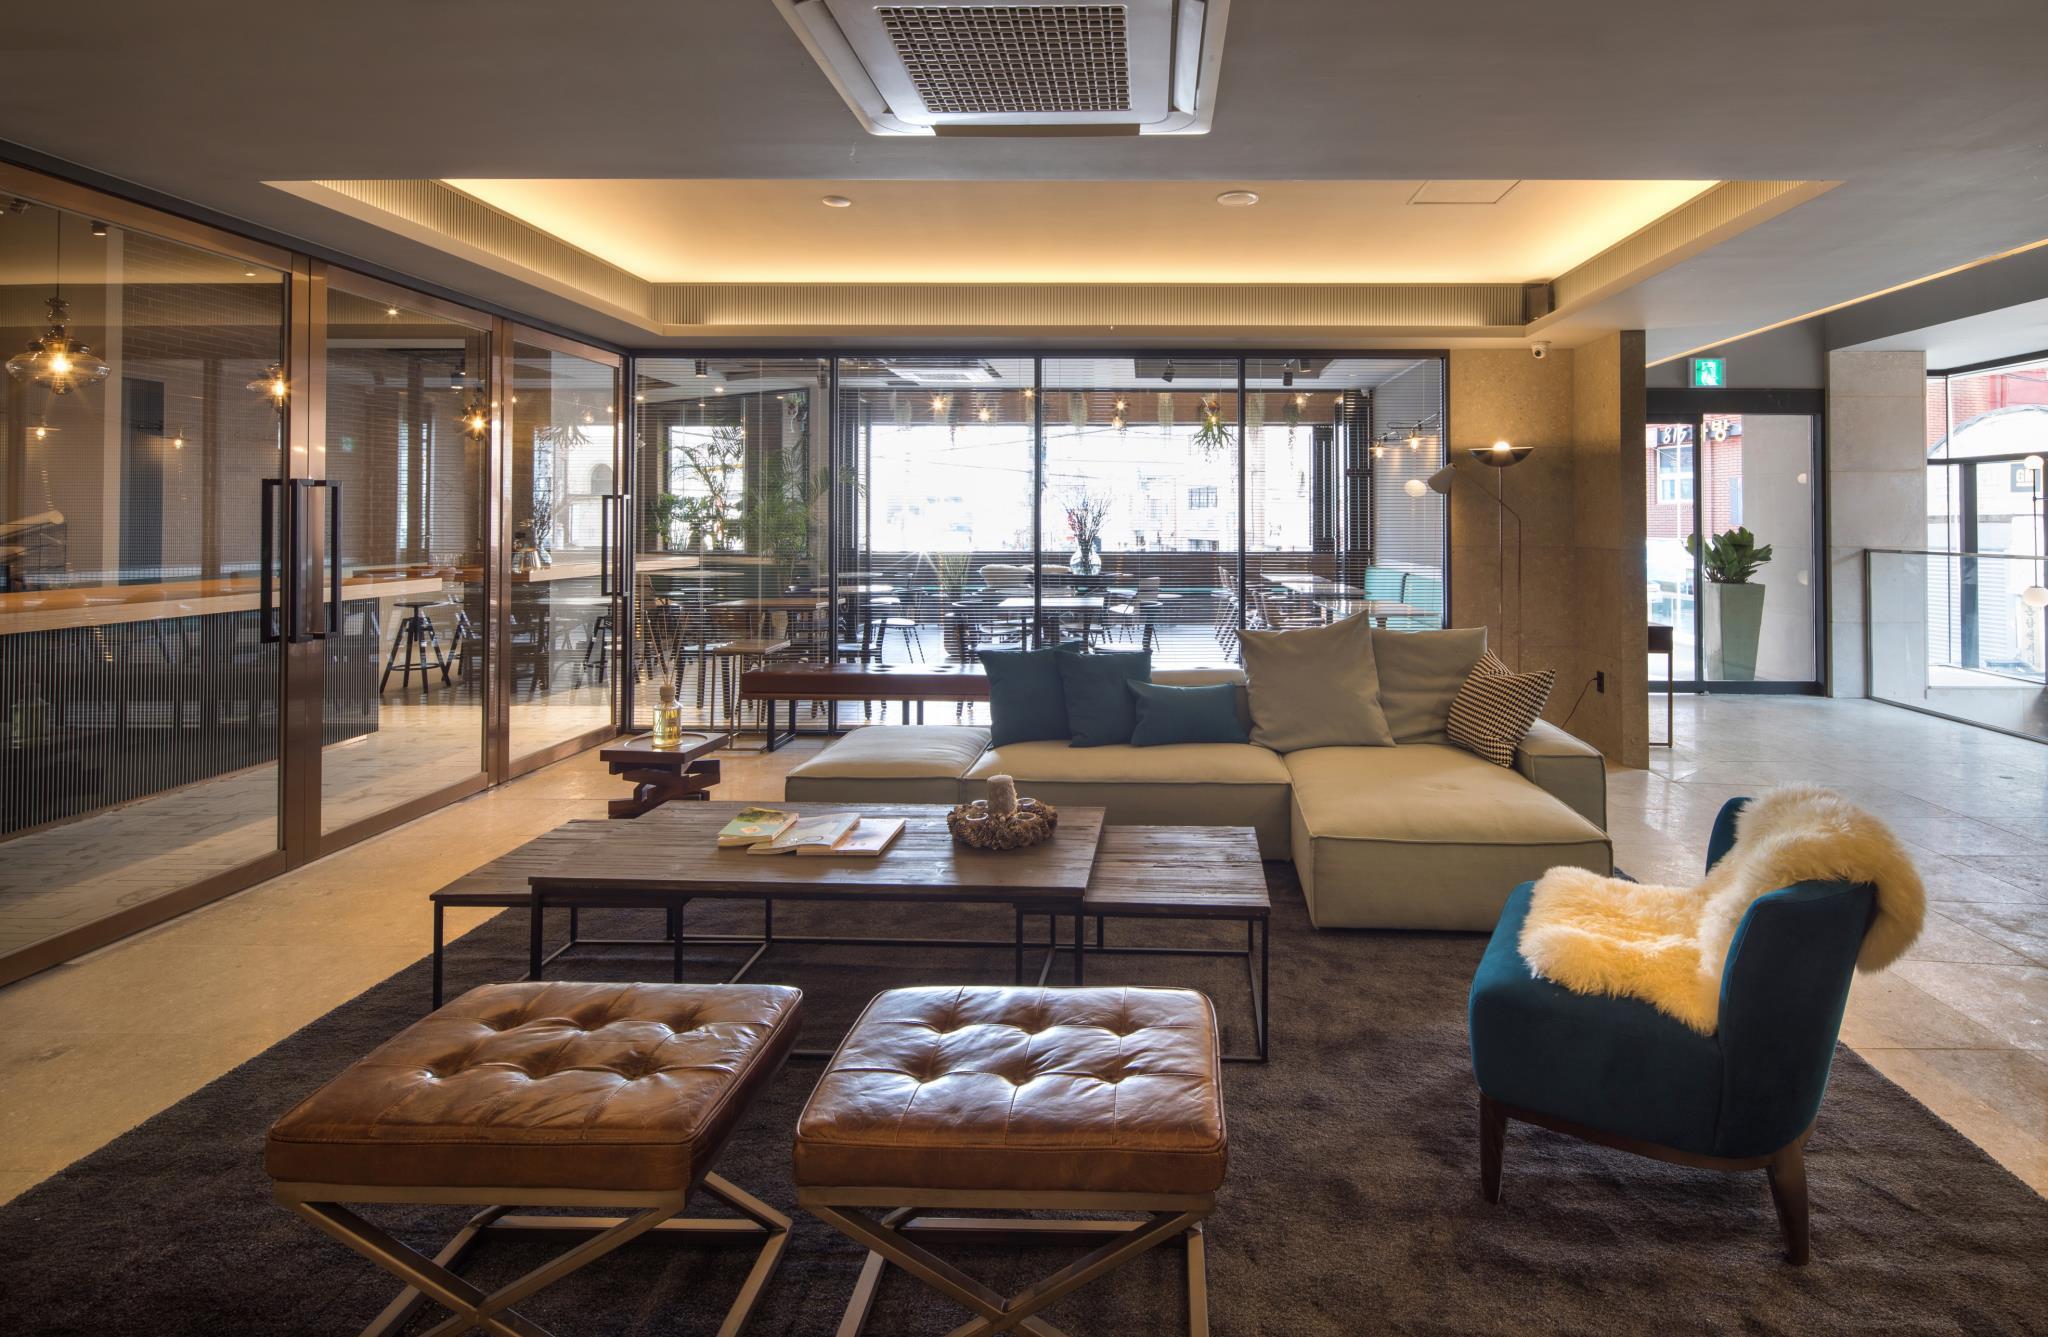 BAYHOUND HOTEL